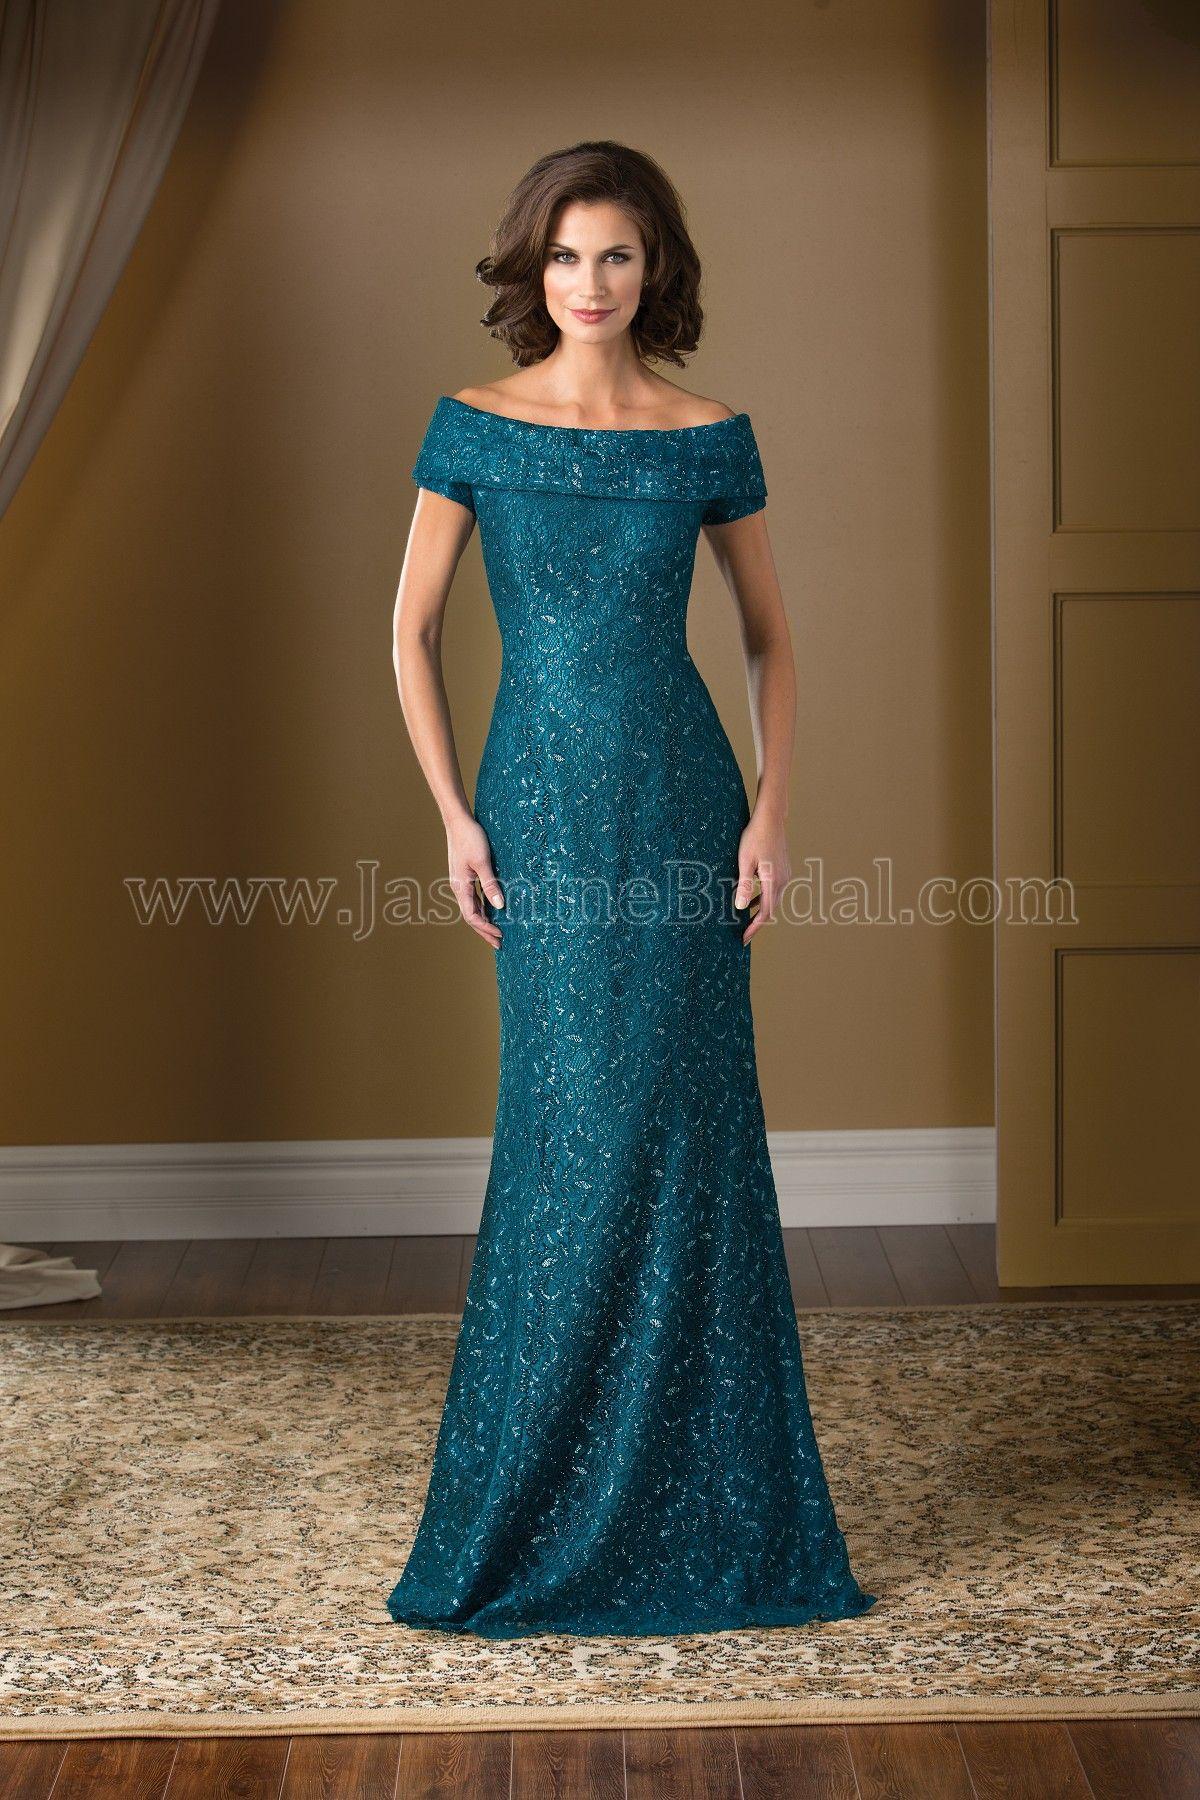 Jade K2283 Mother of the Bride Dresses